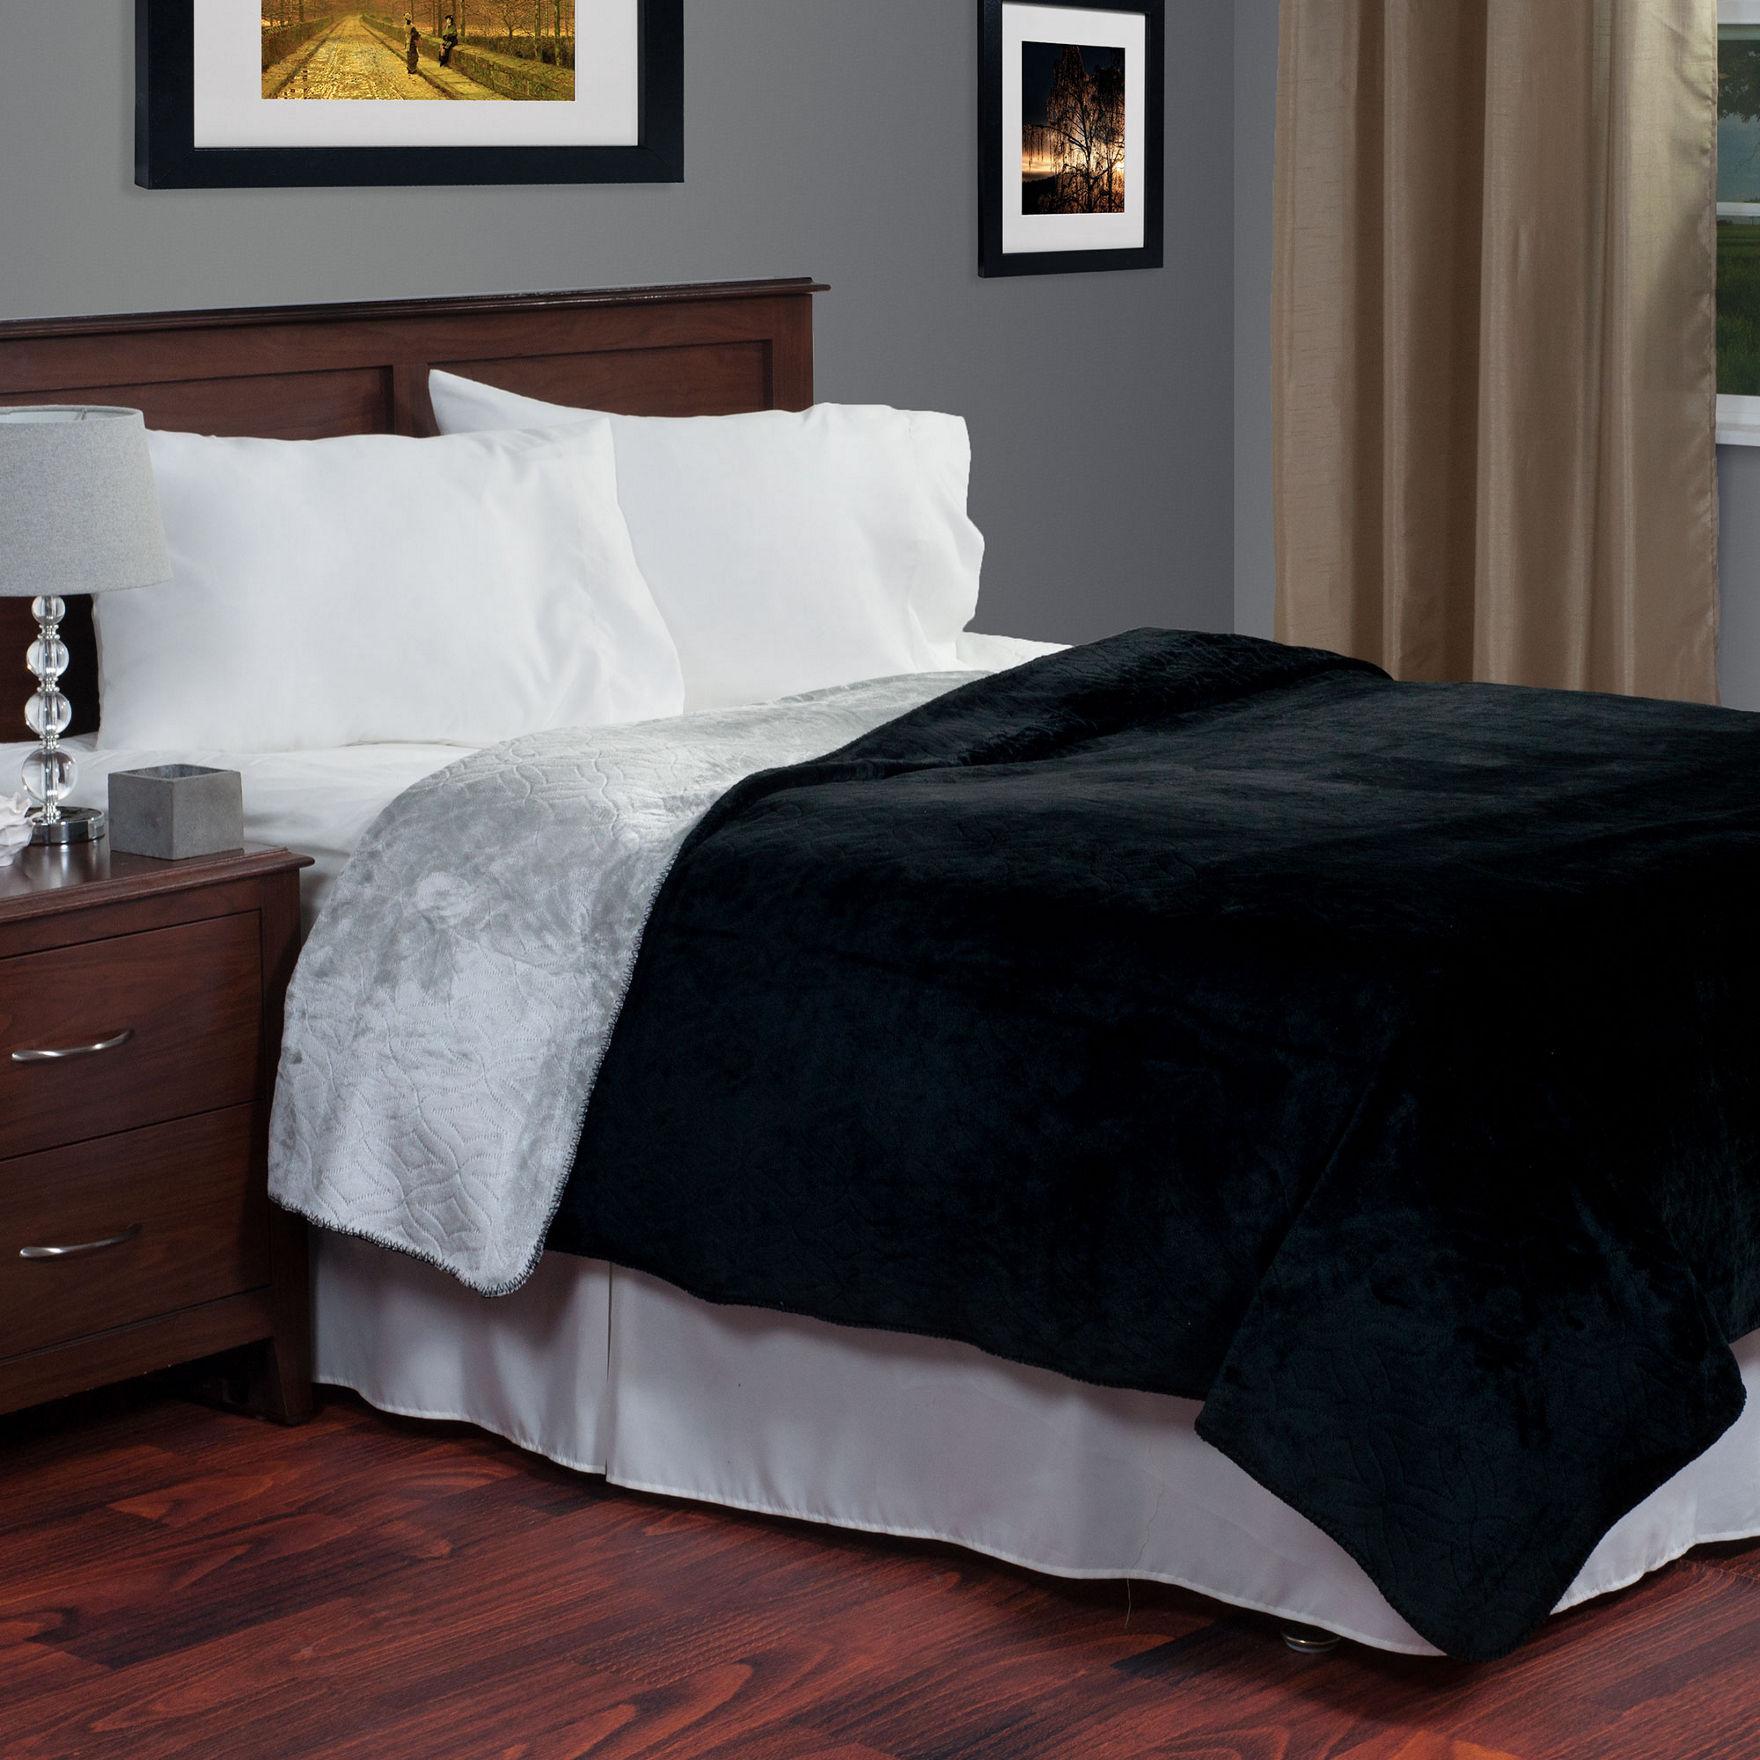 Lavish Home Black/Grey Blankets & Throws